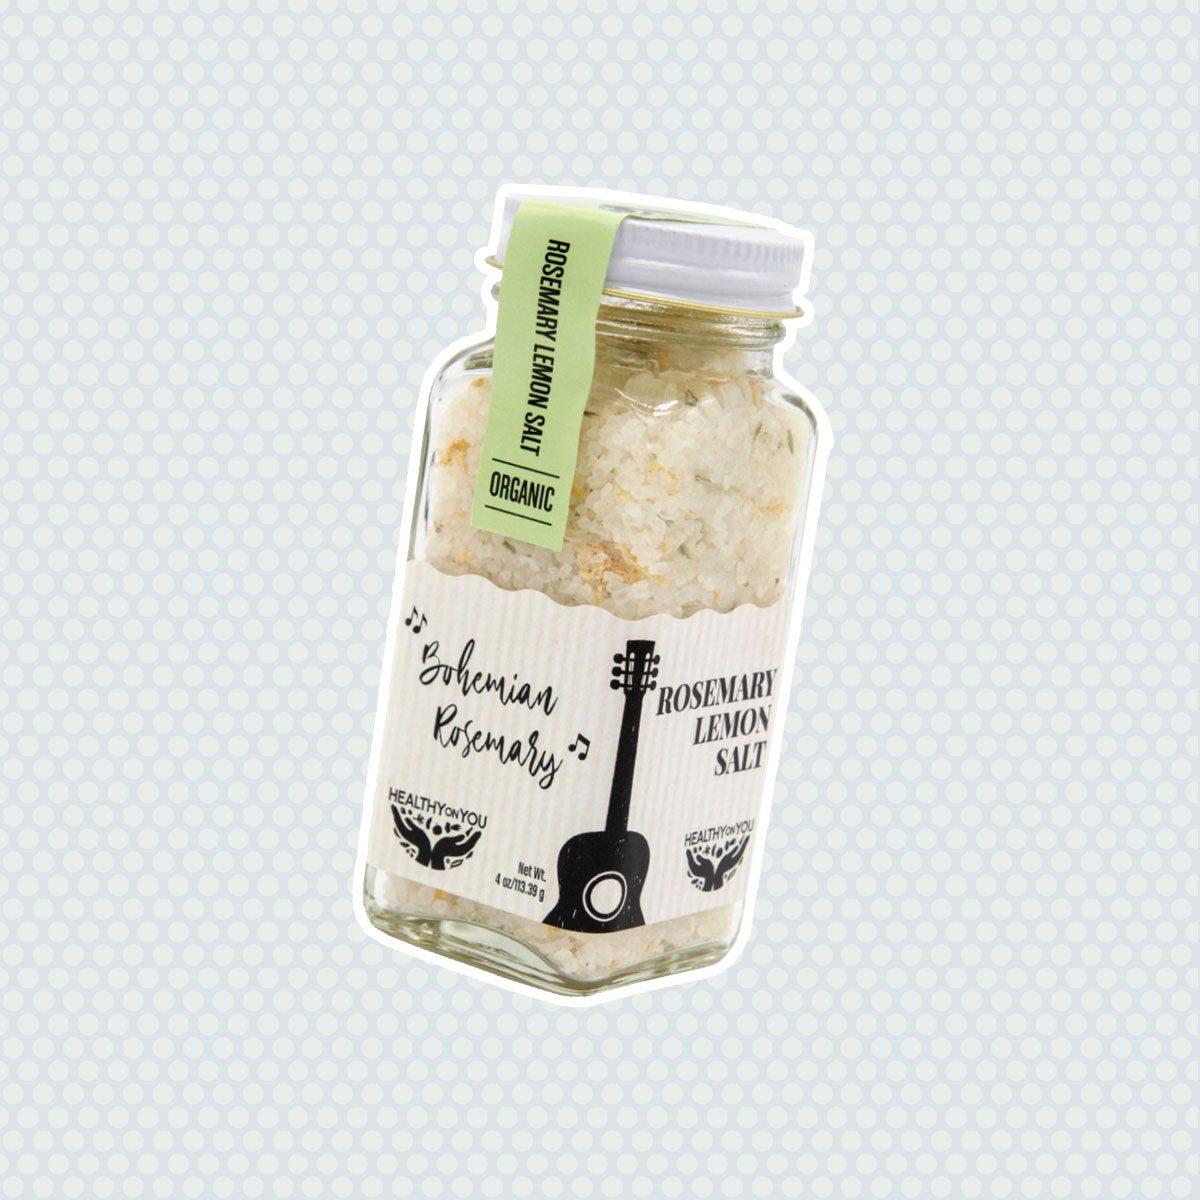 Healthy on You Bohemian Rosemary Salt Blend